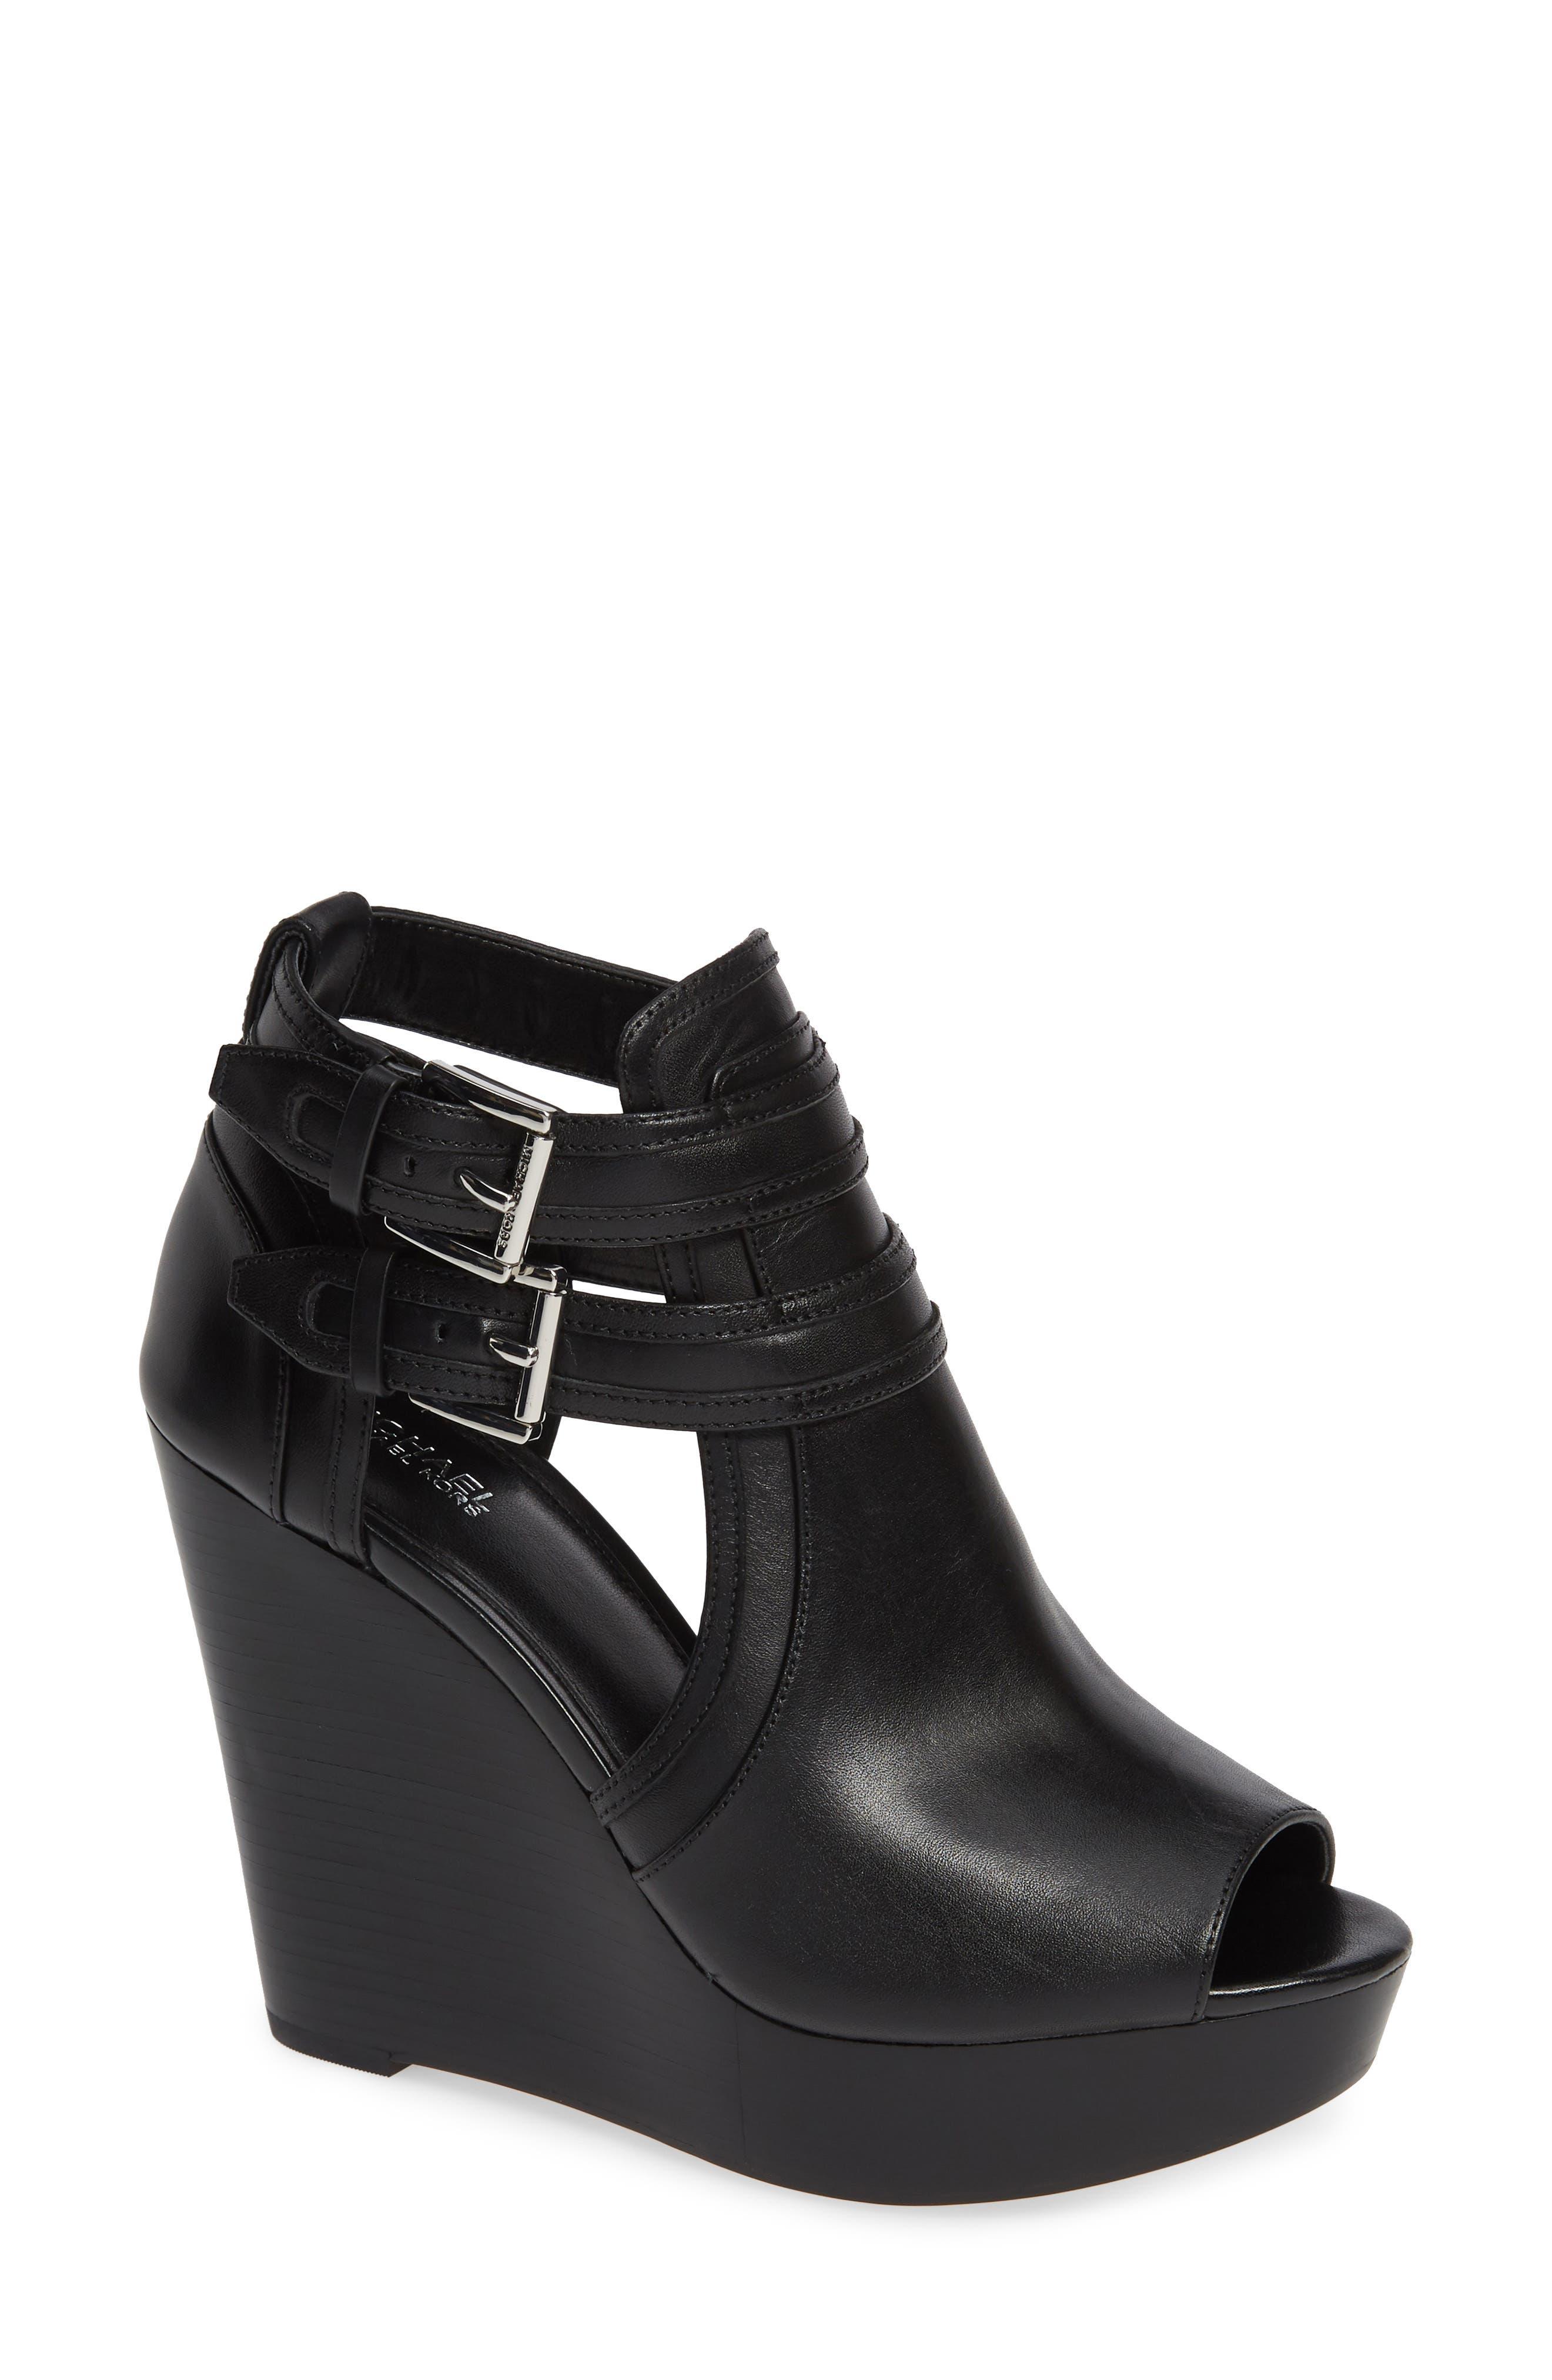 Blaze Wedge Sandal, Main, color, BLACK VACHETTA LEATHER